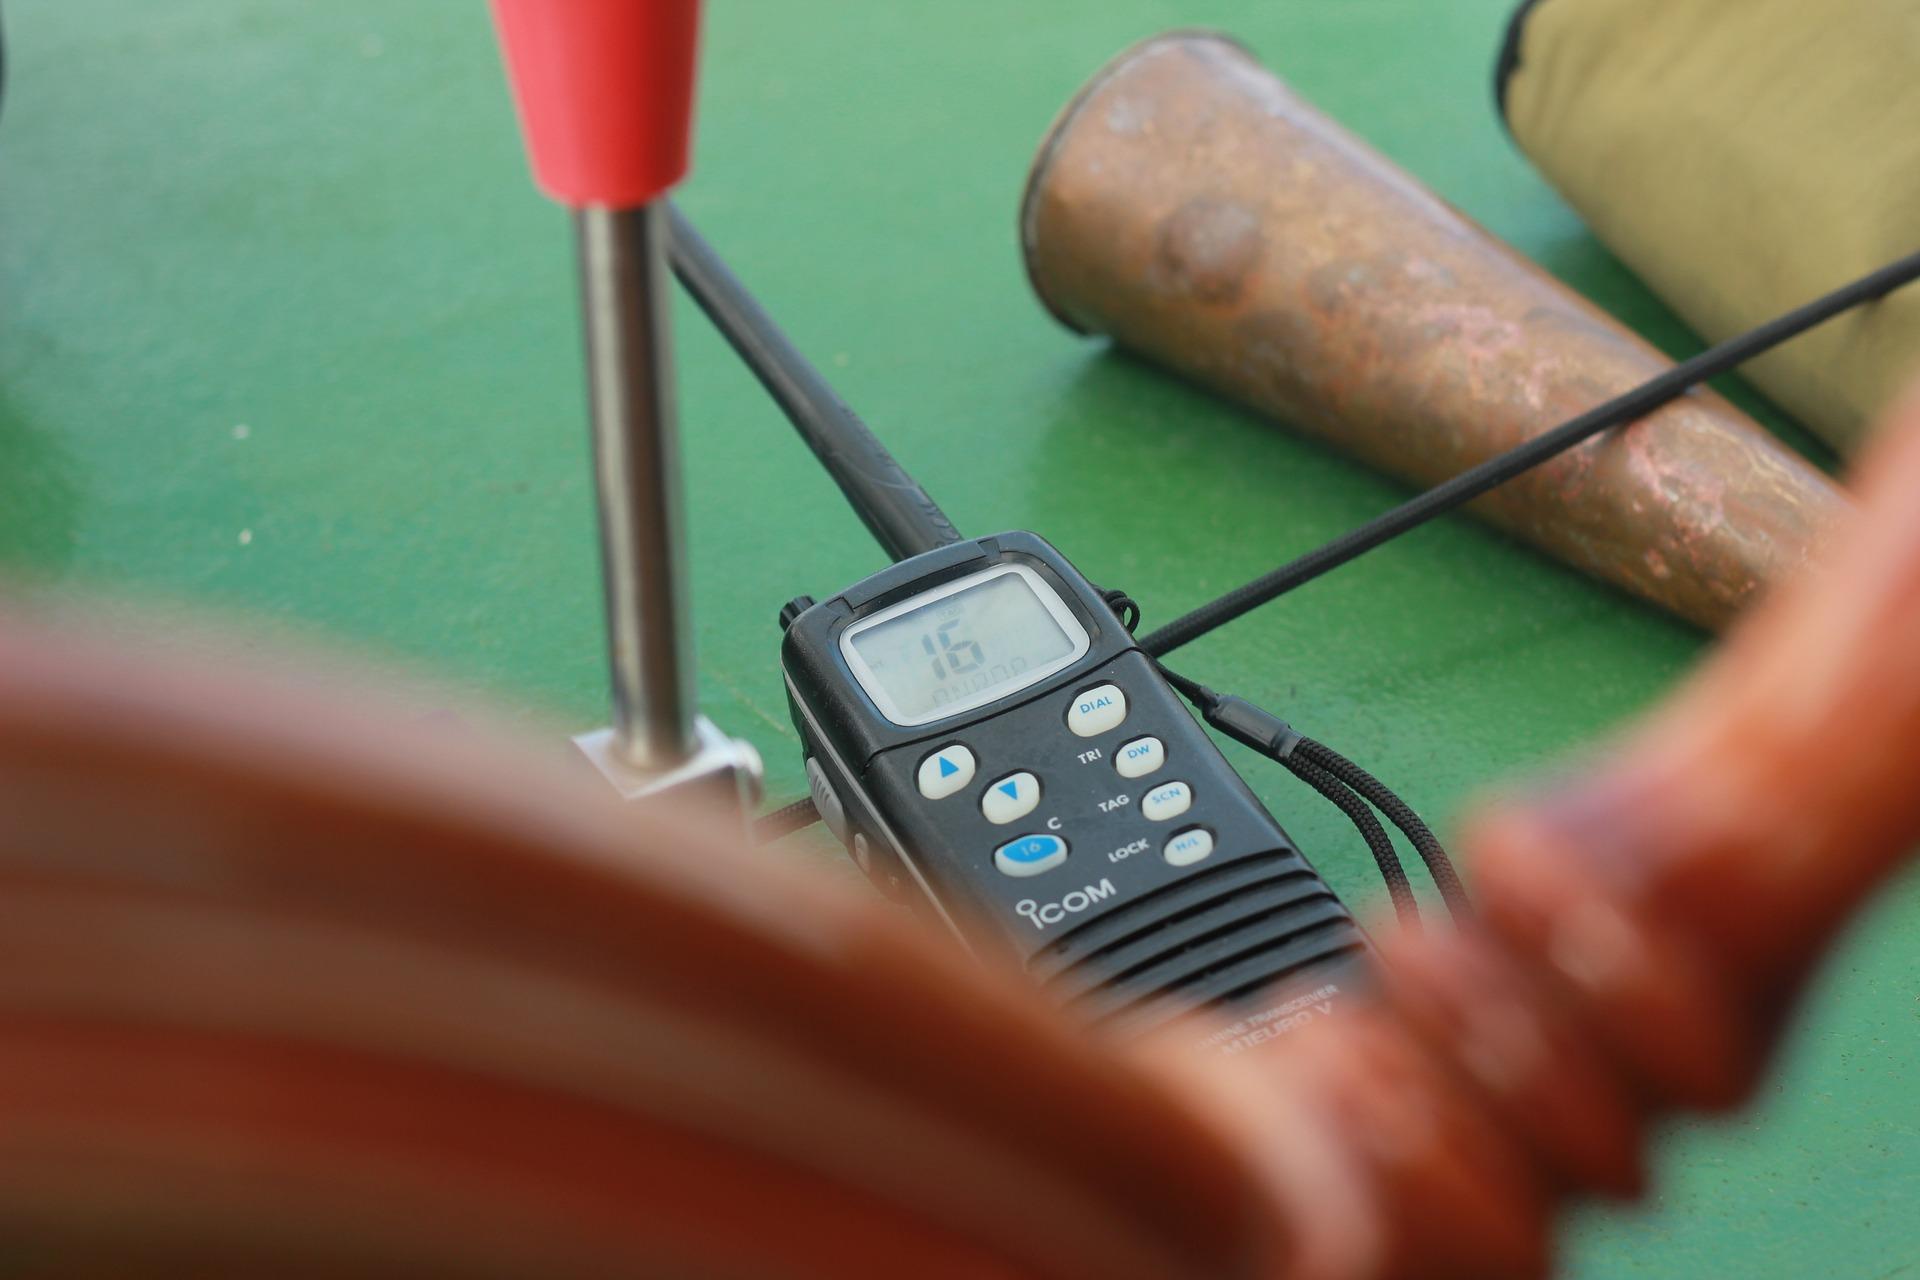 CRR - Radio VHF